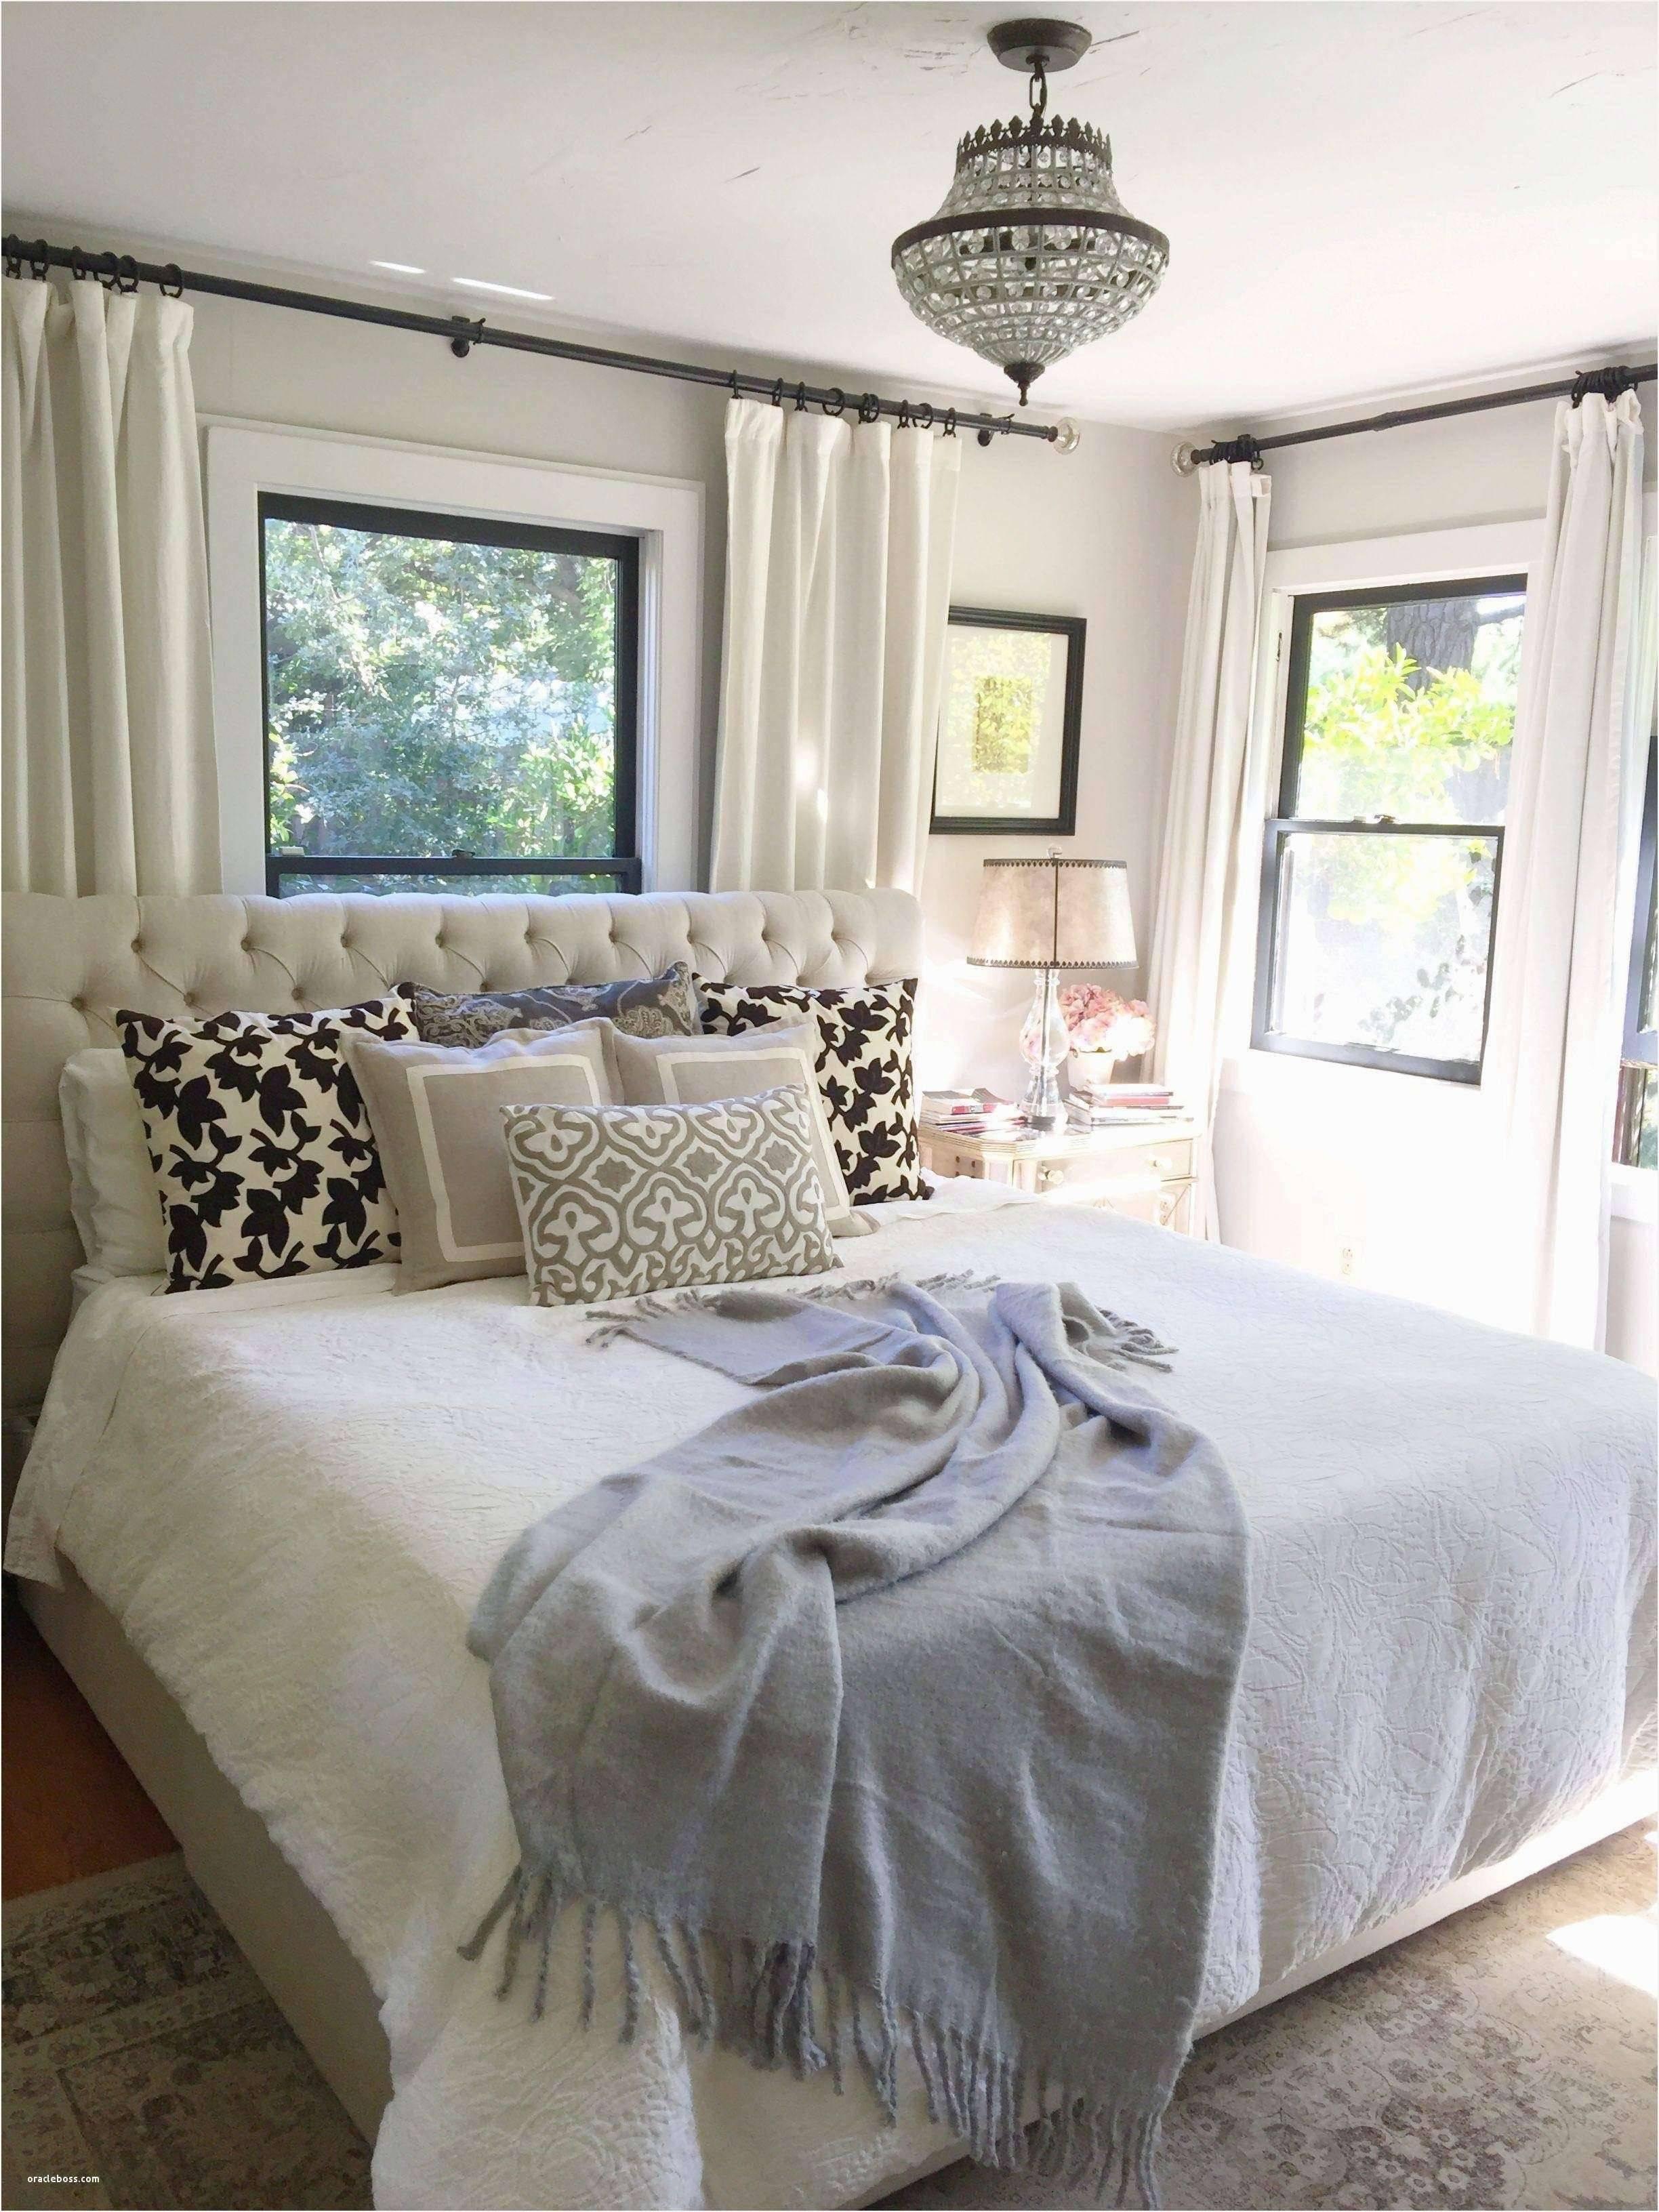 43 fresh master bedroom ideas for couples romantic interior design master bedroom design master bedroom design